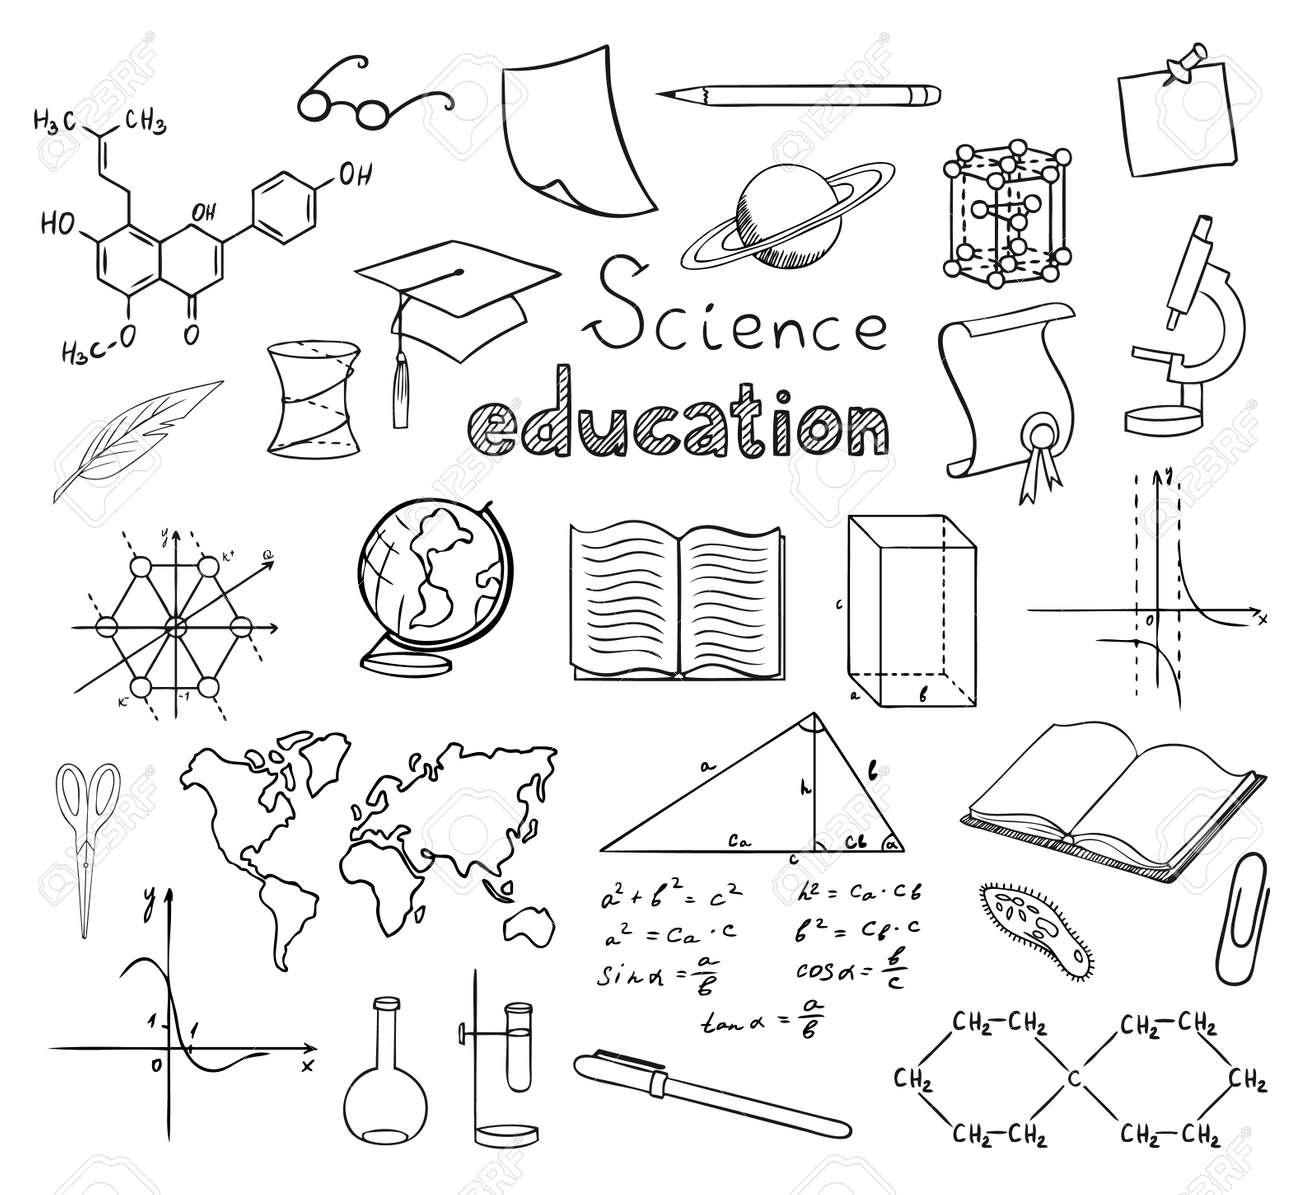 School and education symbols vector royalty free cliparts vectors school and education symbols vector stock vector 10446435 buycottarizona Image collections